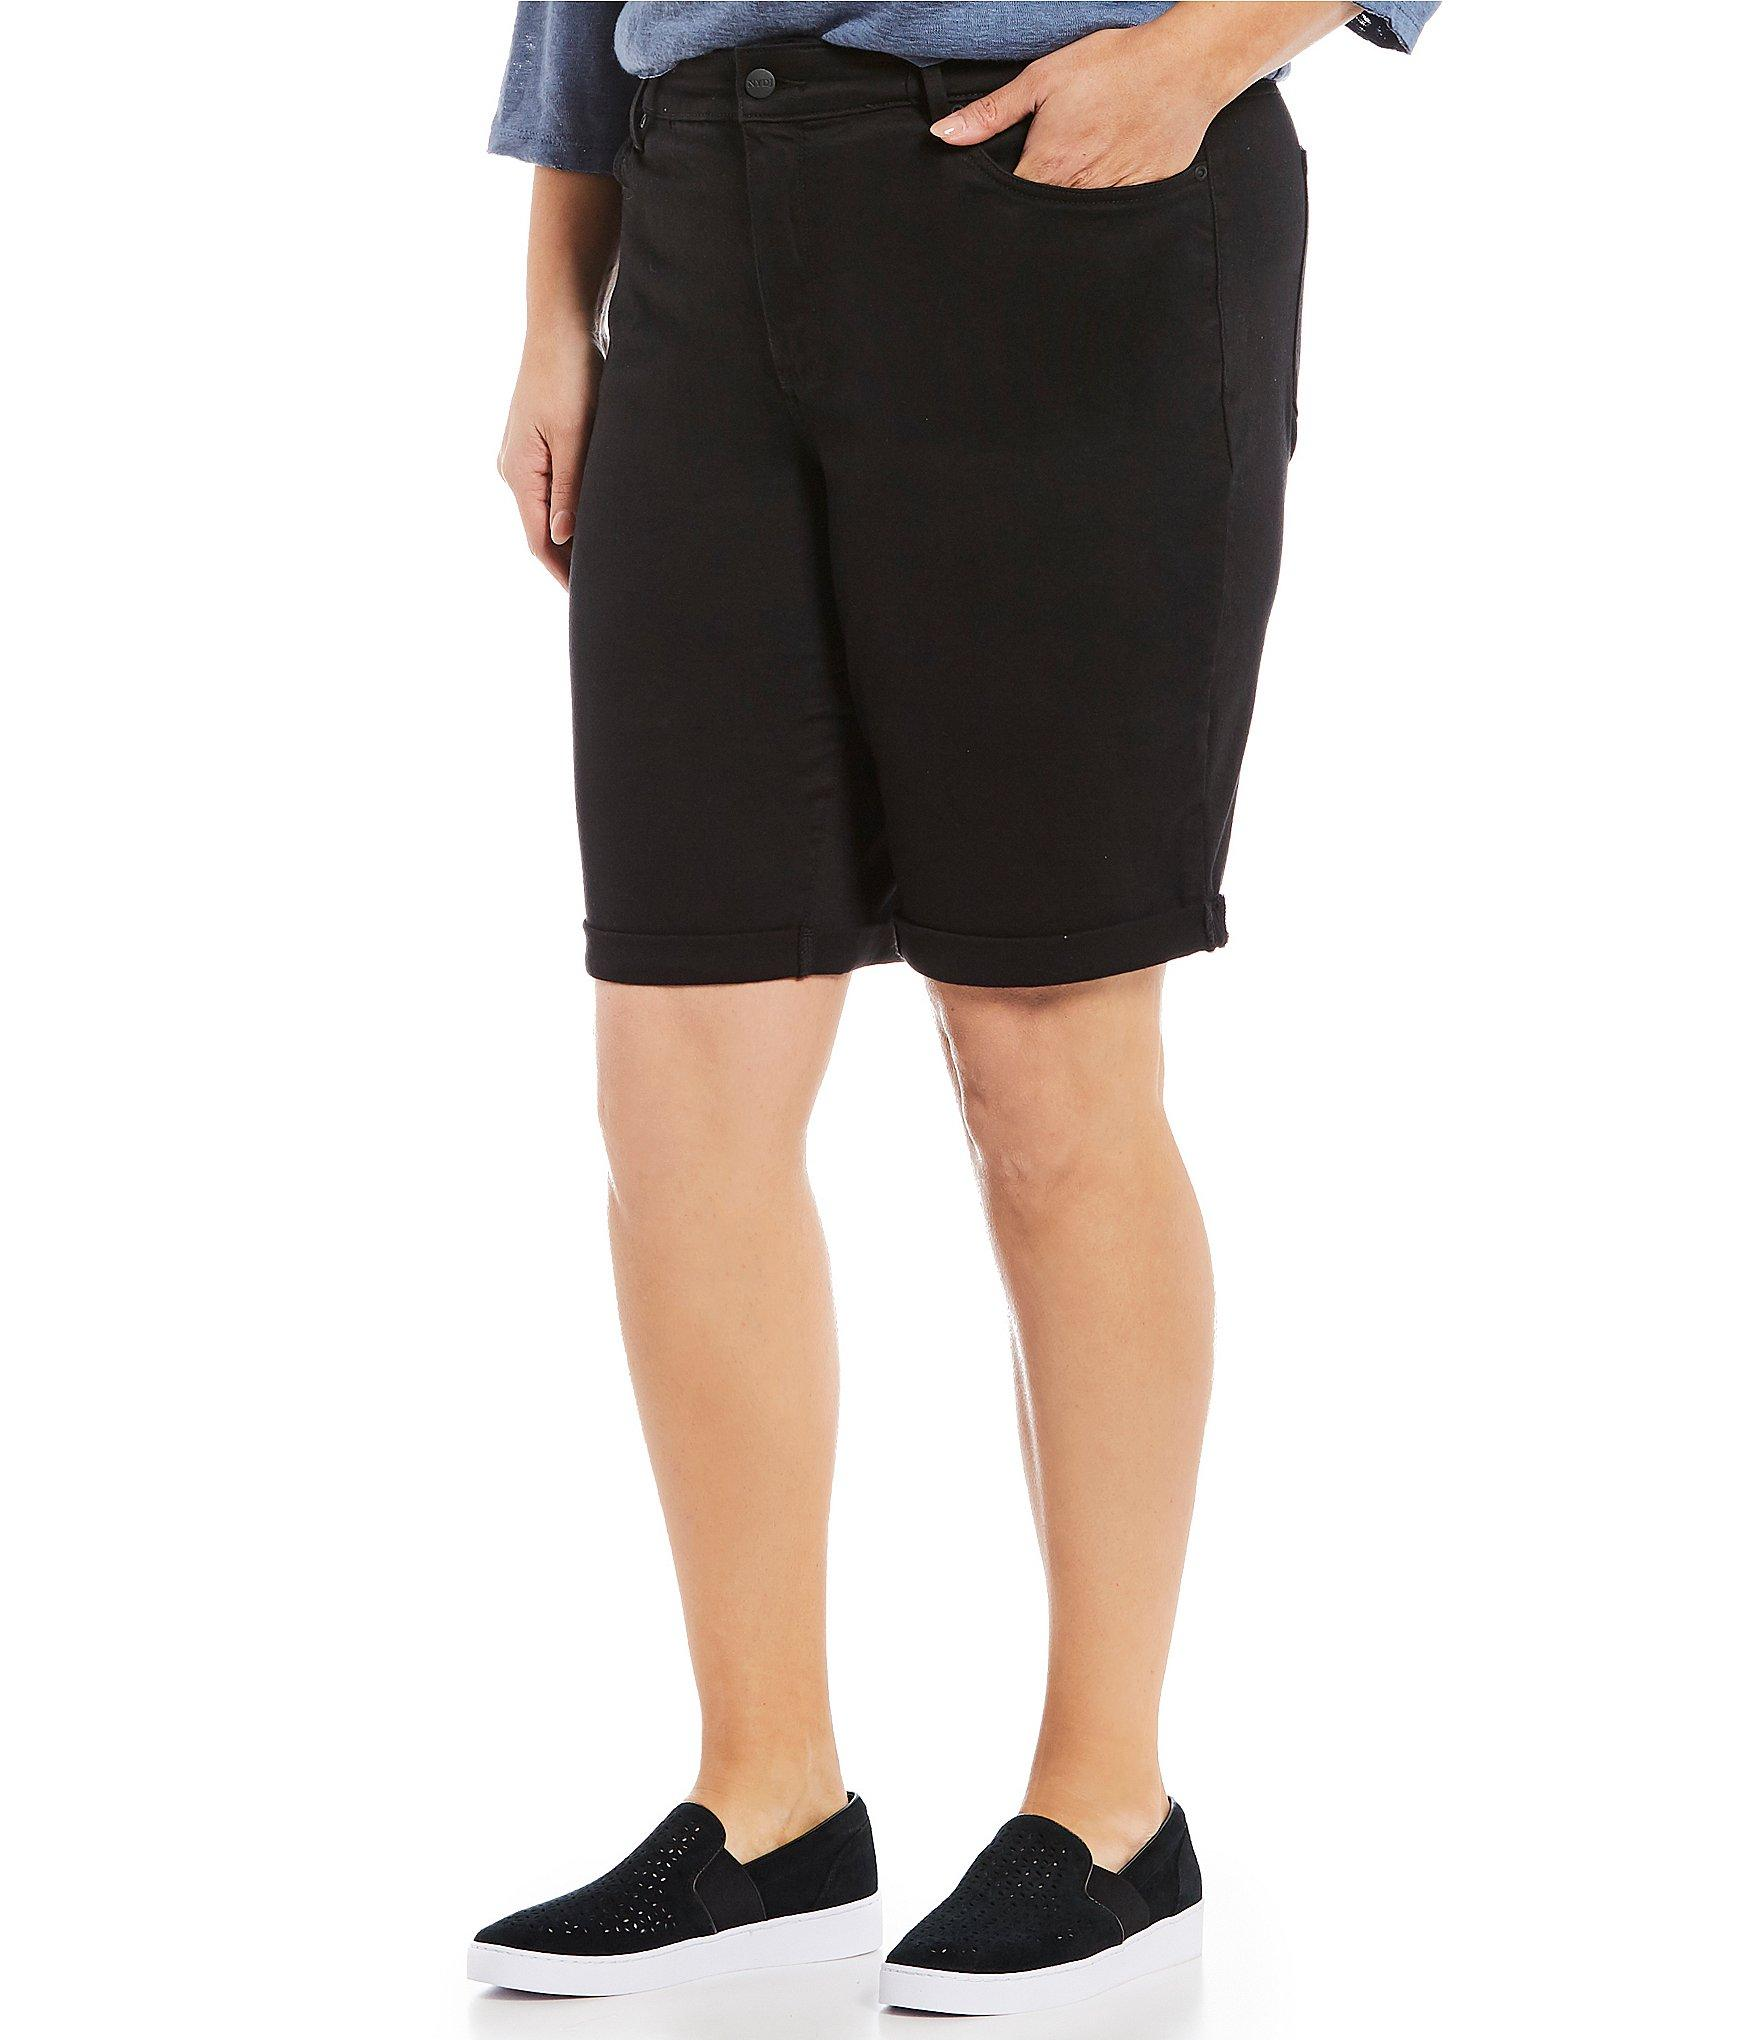 e38ca93e4e6 Lyst - NYDJ Plus Size Briella Roll Cuff Bermuda Shorts in Black